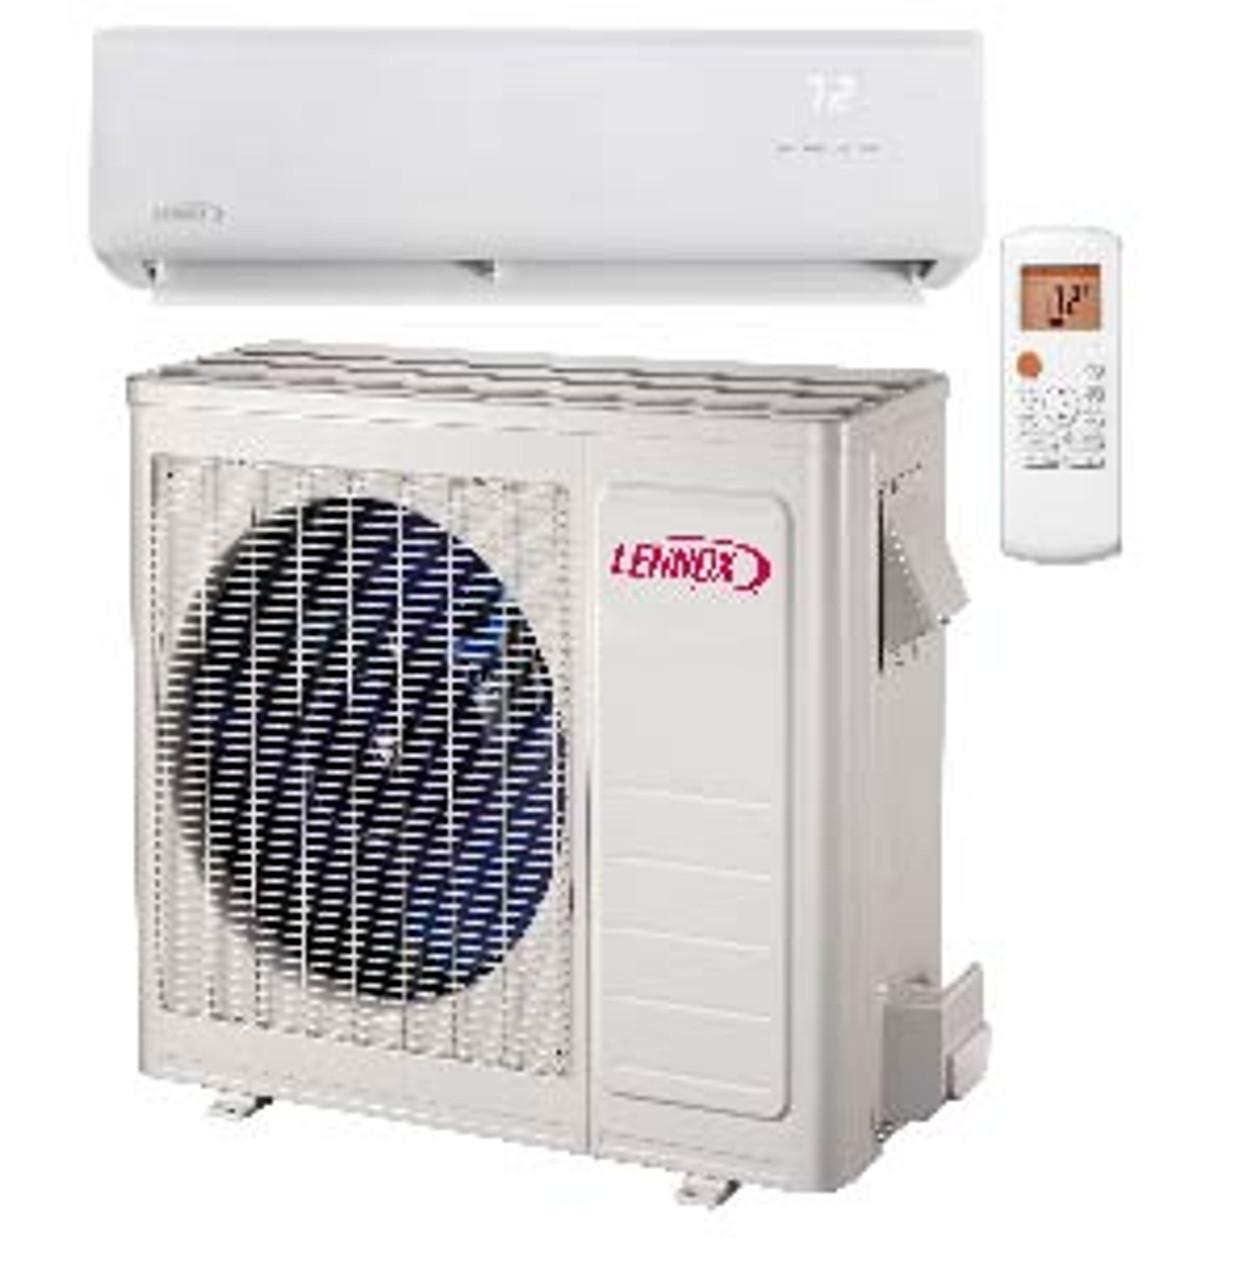 Lennox MP Series .75 Ton Single Zone 9,000 BTU Heat Pump Mini Split System